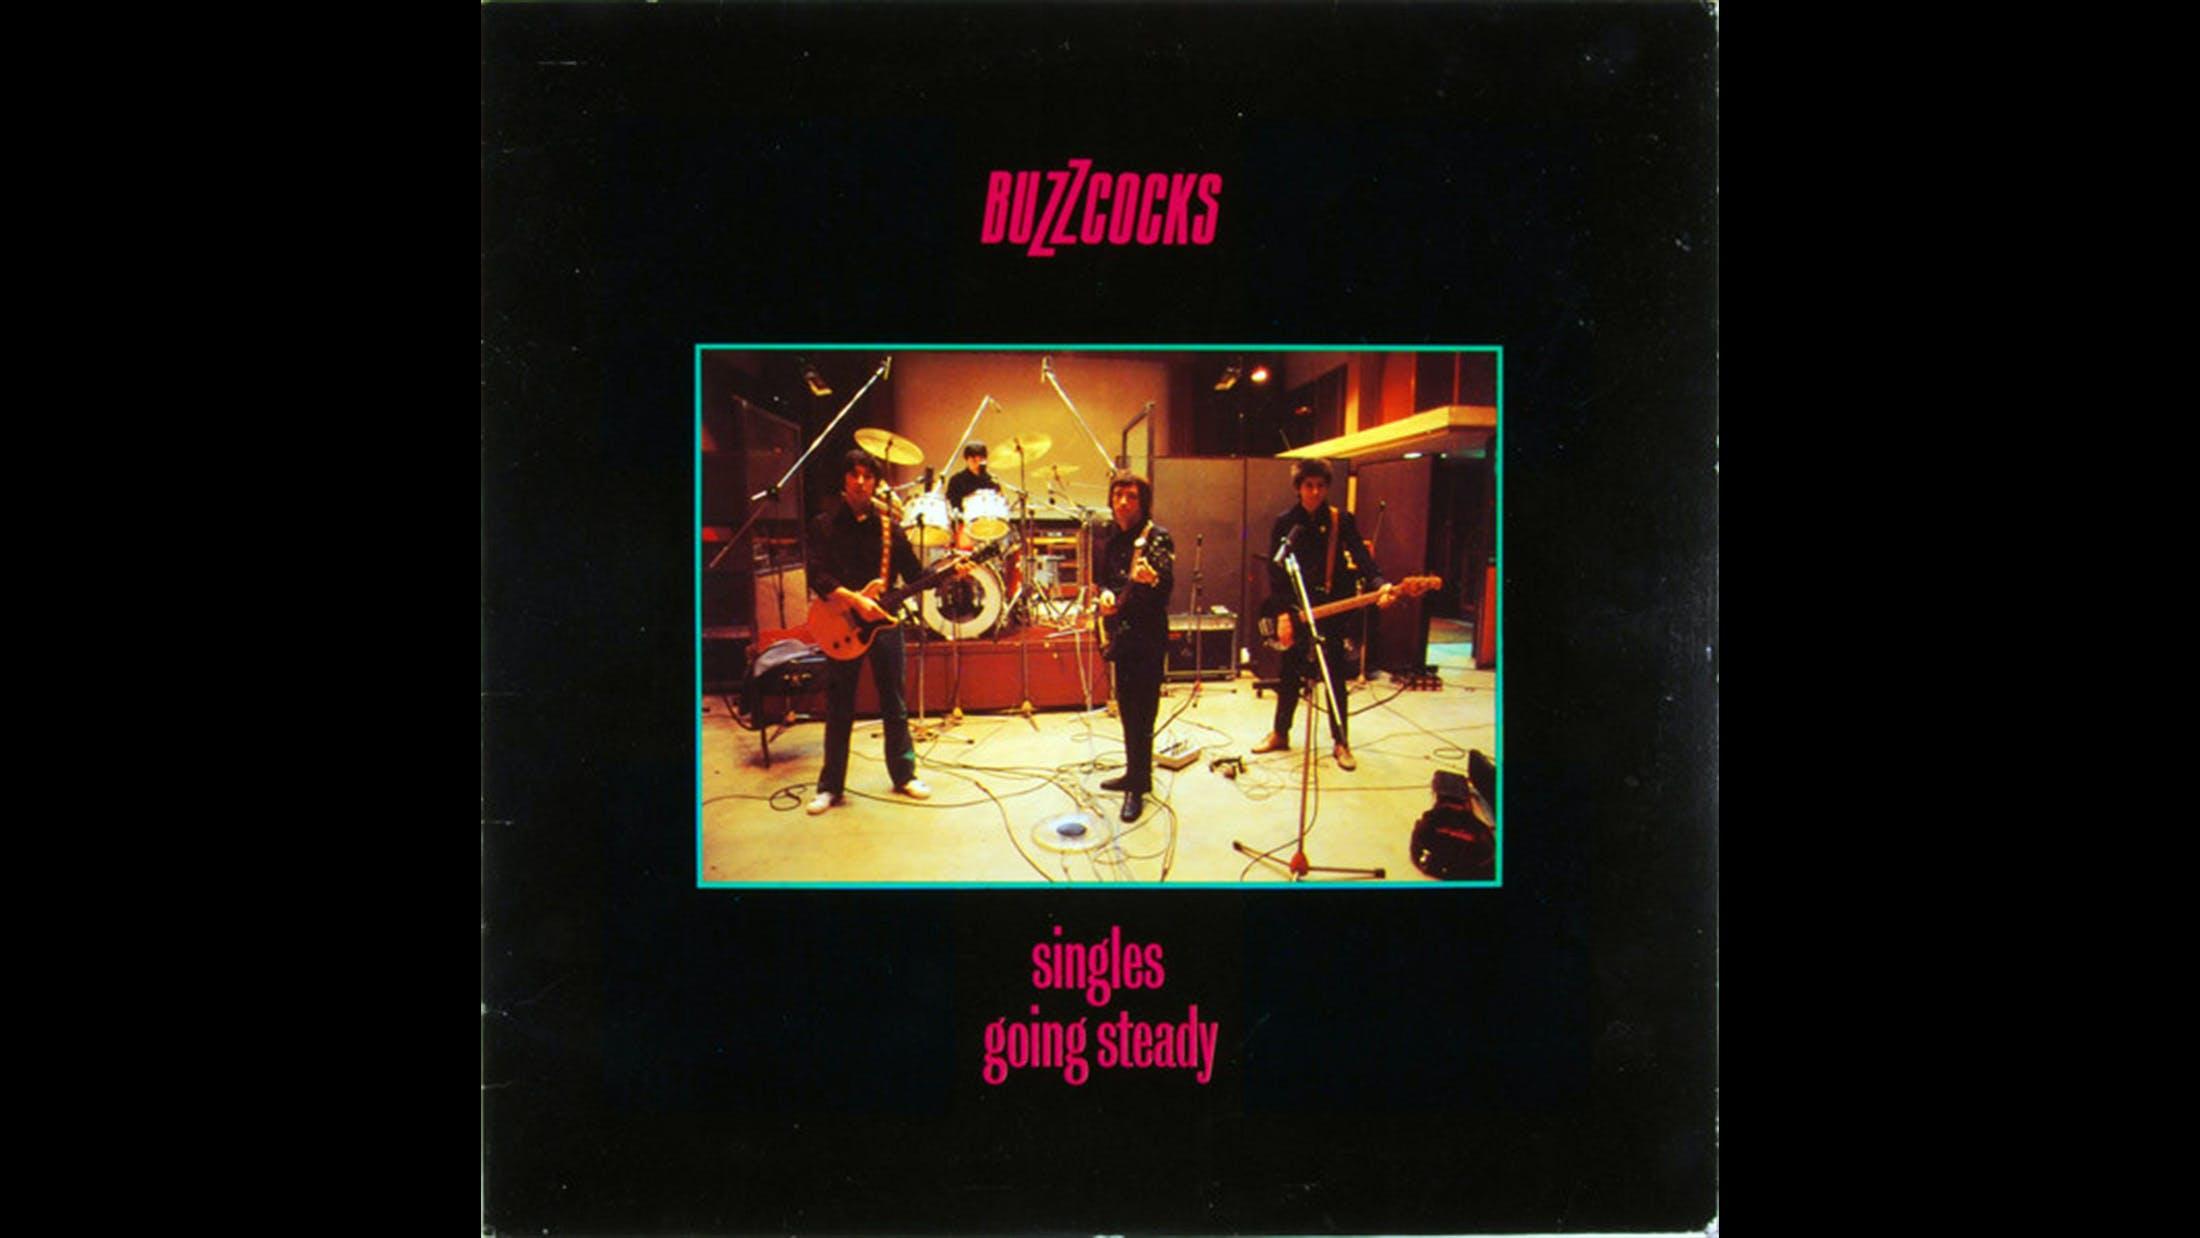 31. Buzzcocks - Singles Going Steady (1981)